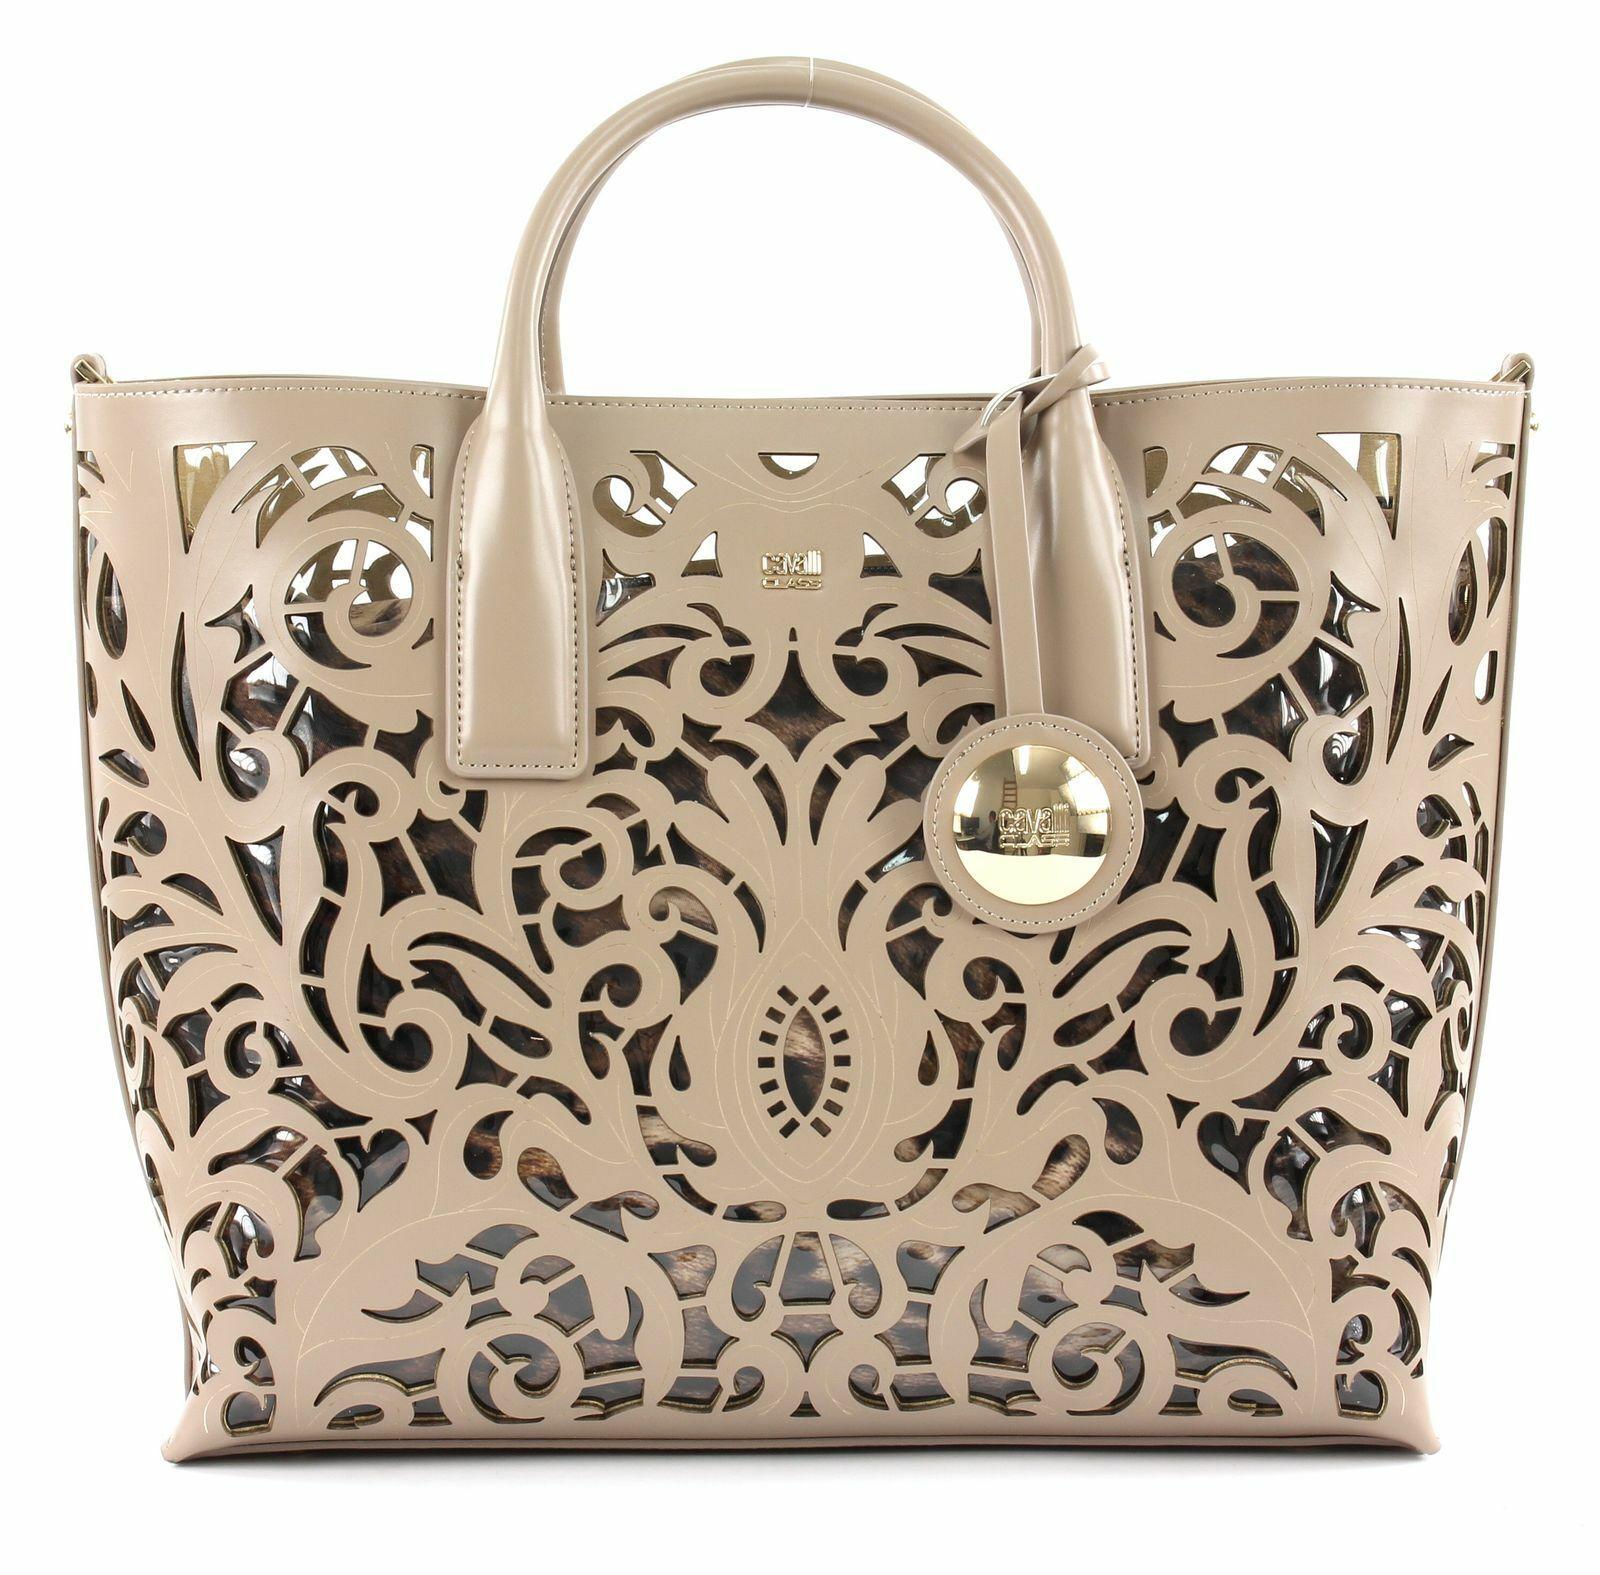 Neu Beige Taupe Tasche Umhängetasche Bag Hand Brigitte CLASS